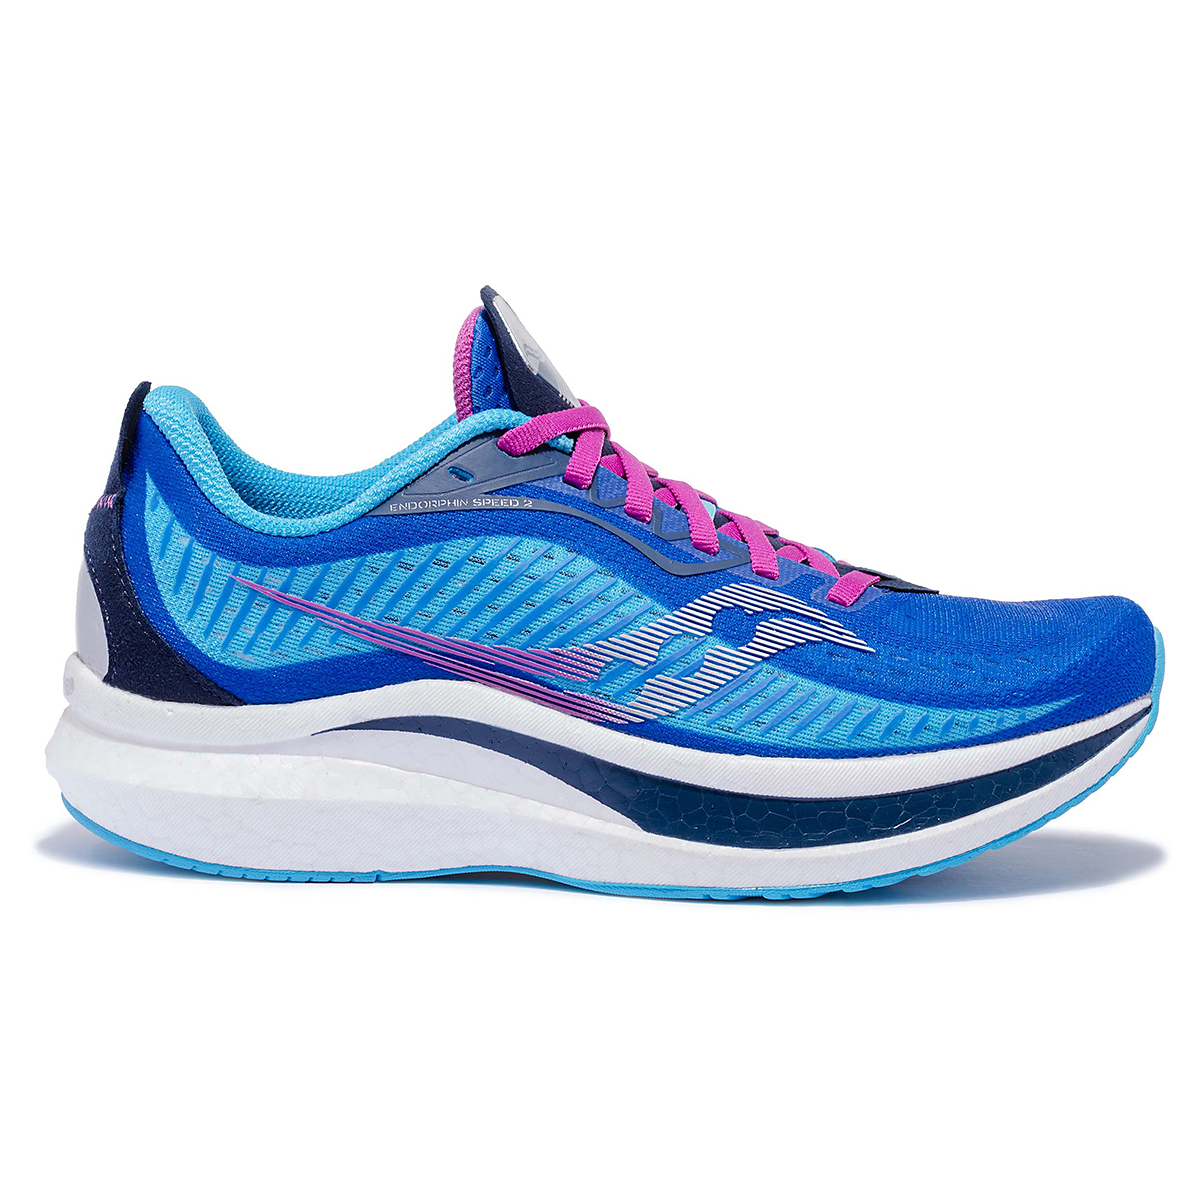 Women's Saucony Endorphin Speed 2 Running Shoe - Color: Royal / Blaze - Size: 5 - Width: Regular, Royal / Blaze, large, image 1